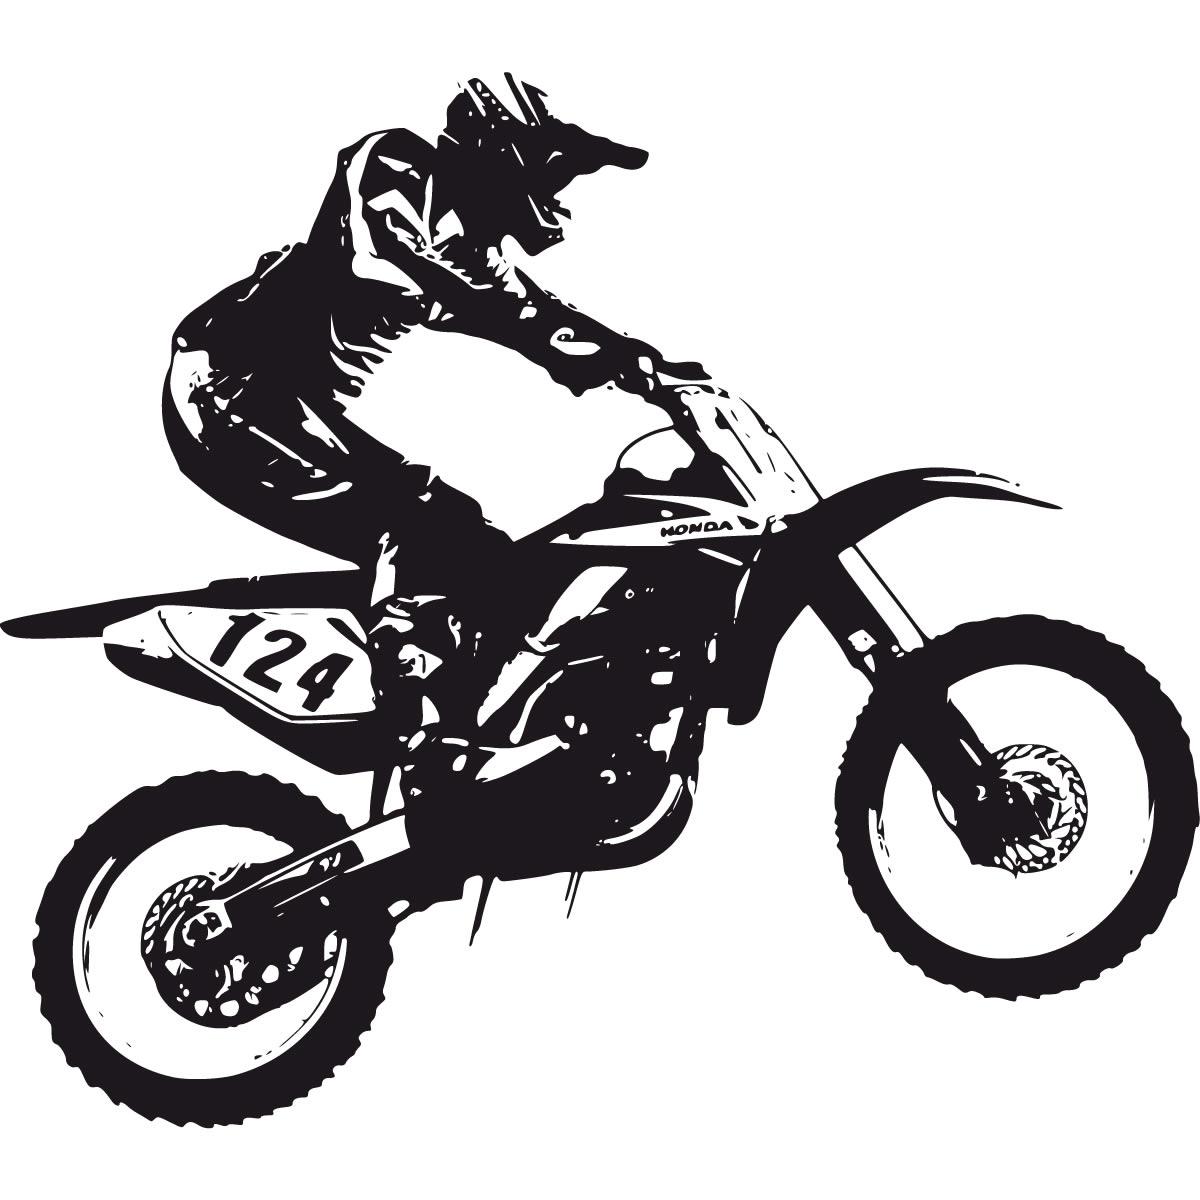 Motocross bike clipart banner free download 87+ Motocross Clipart | ClipartLook banner free download